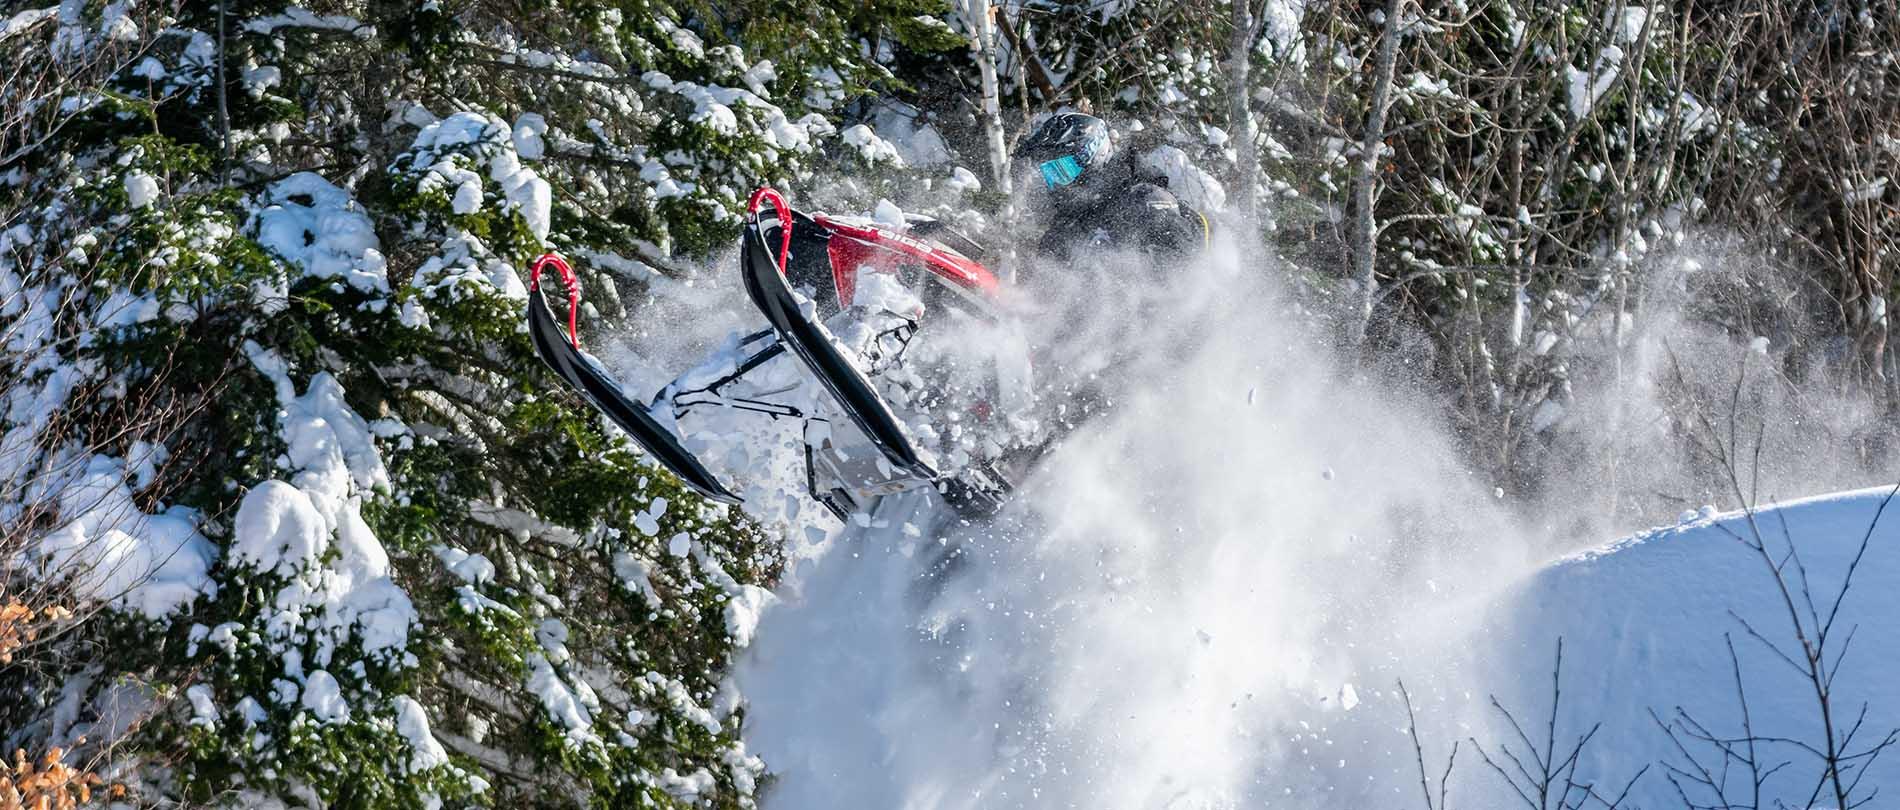 Taiga electric snowmobile | Photo: Taiga